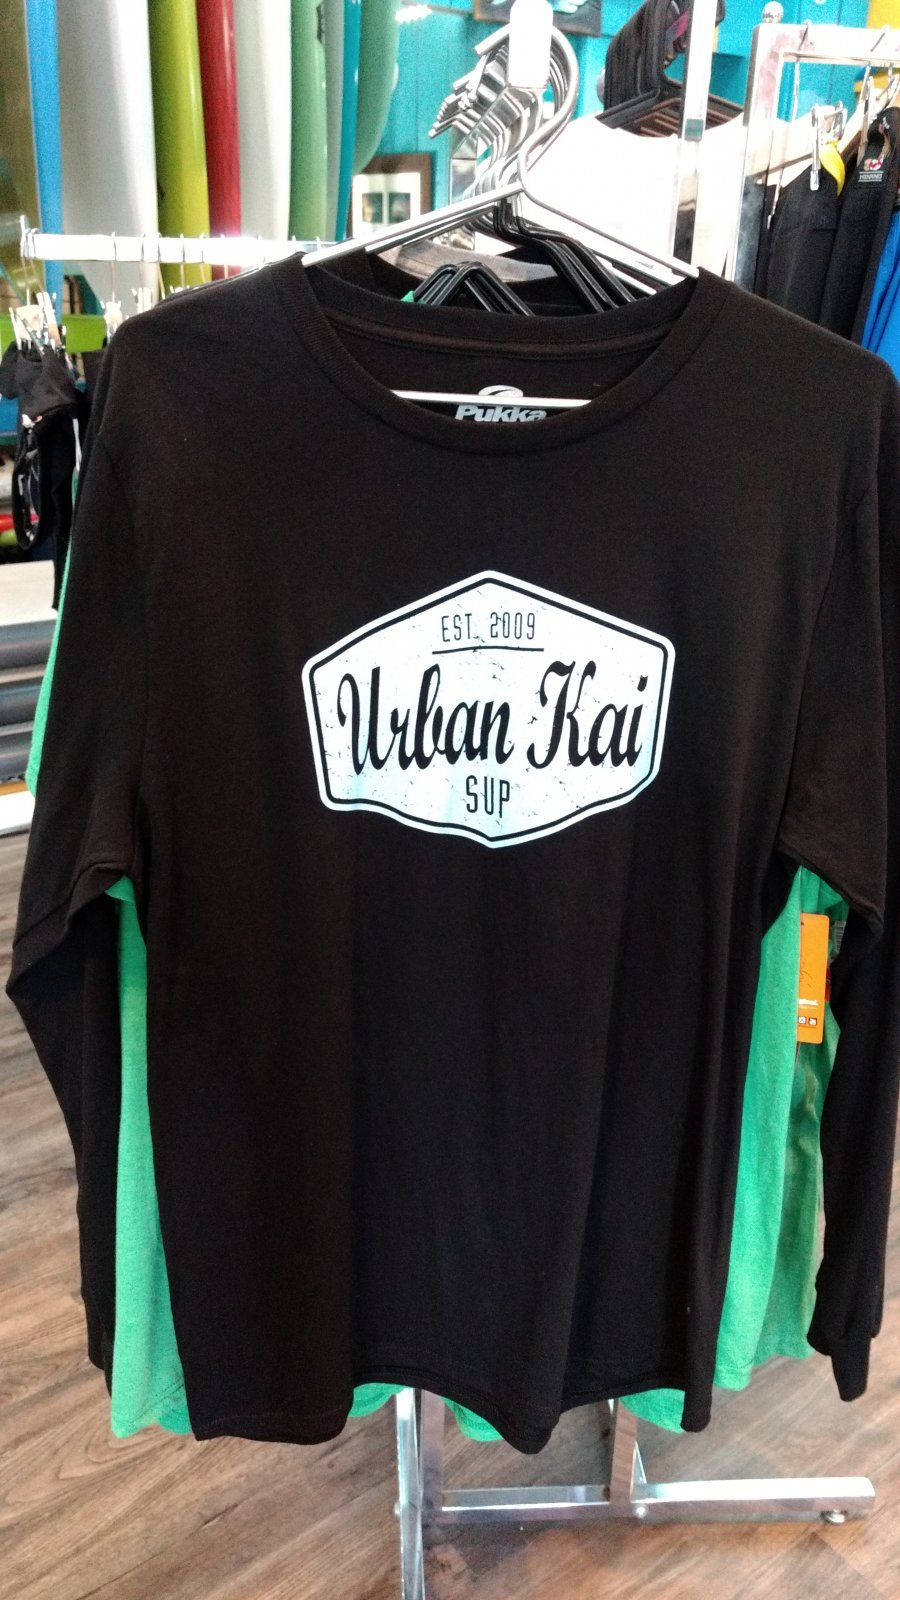 Urban Kai Premium Long Sleeve Tee Black - XLarge